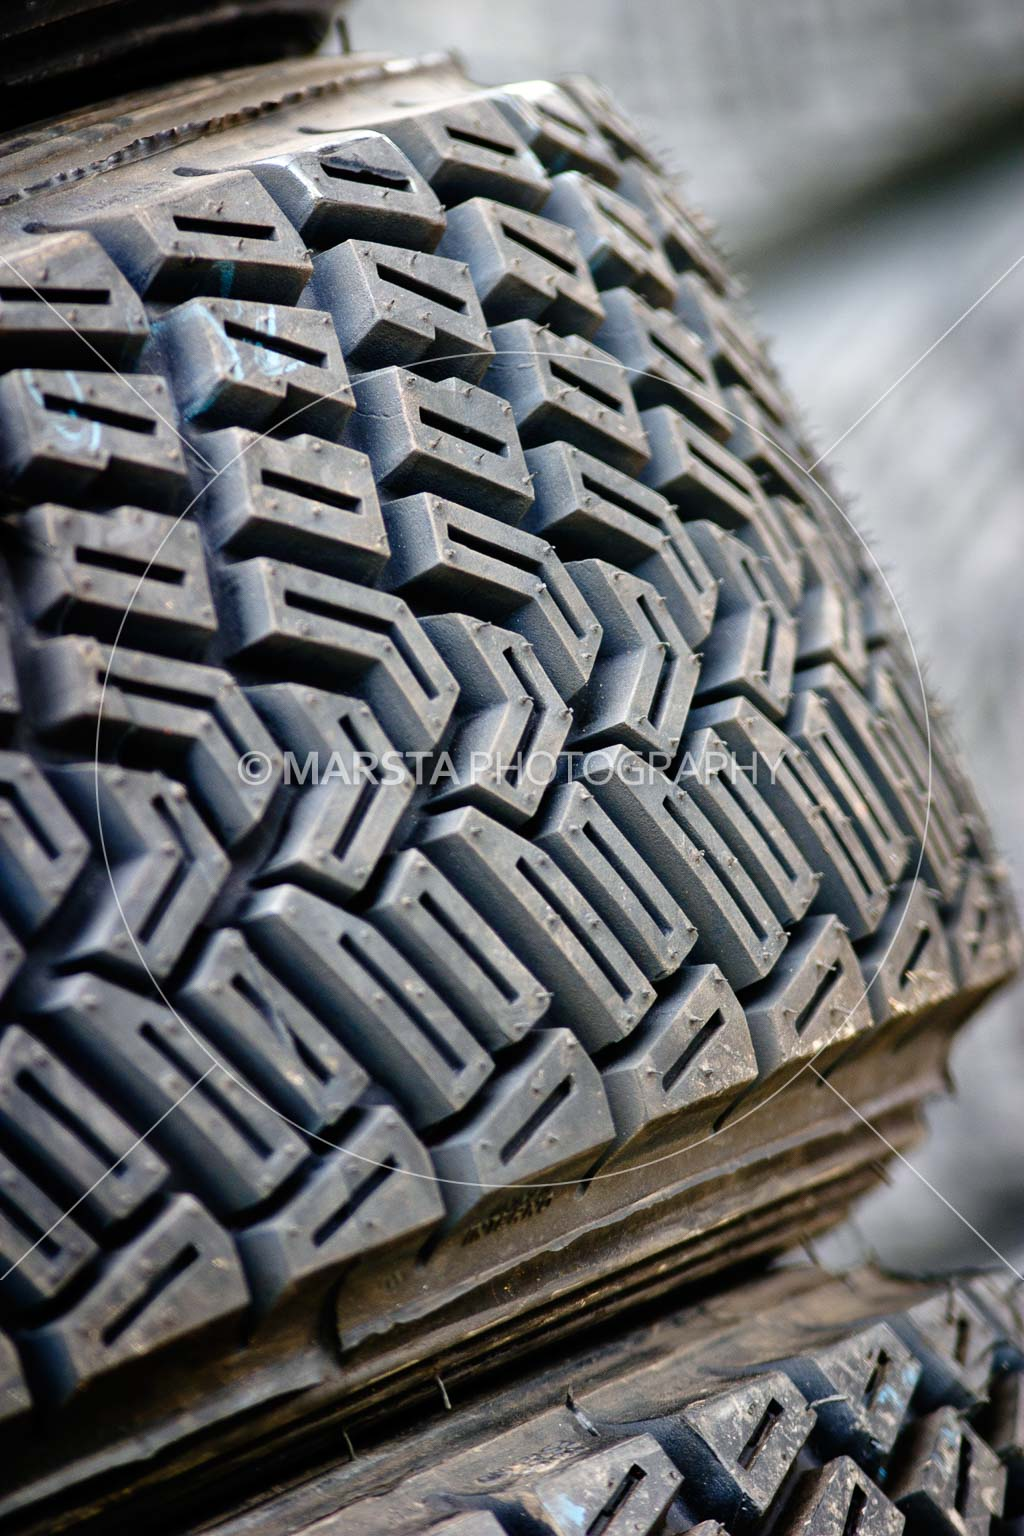 050605ARC;5 June 2005;ARC;Australia;Australian Rally Championship;Coates Rally Queensland;Imbil;QLD;Queensland;Sunshine Coast;auto;close-up;detail;dirt tyre;motorsport;racing;rally tyre;tyre